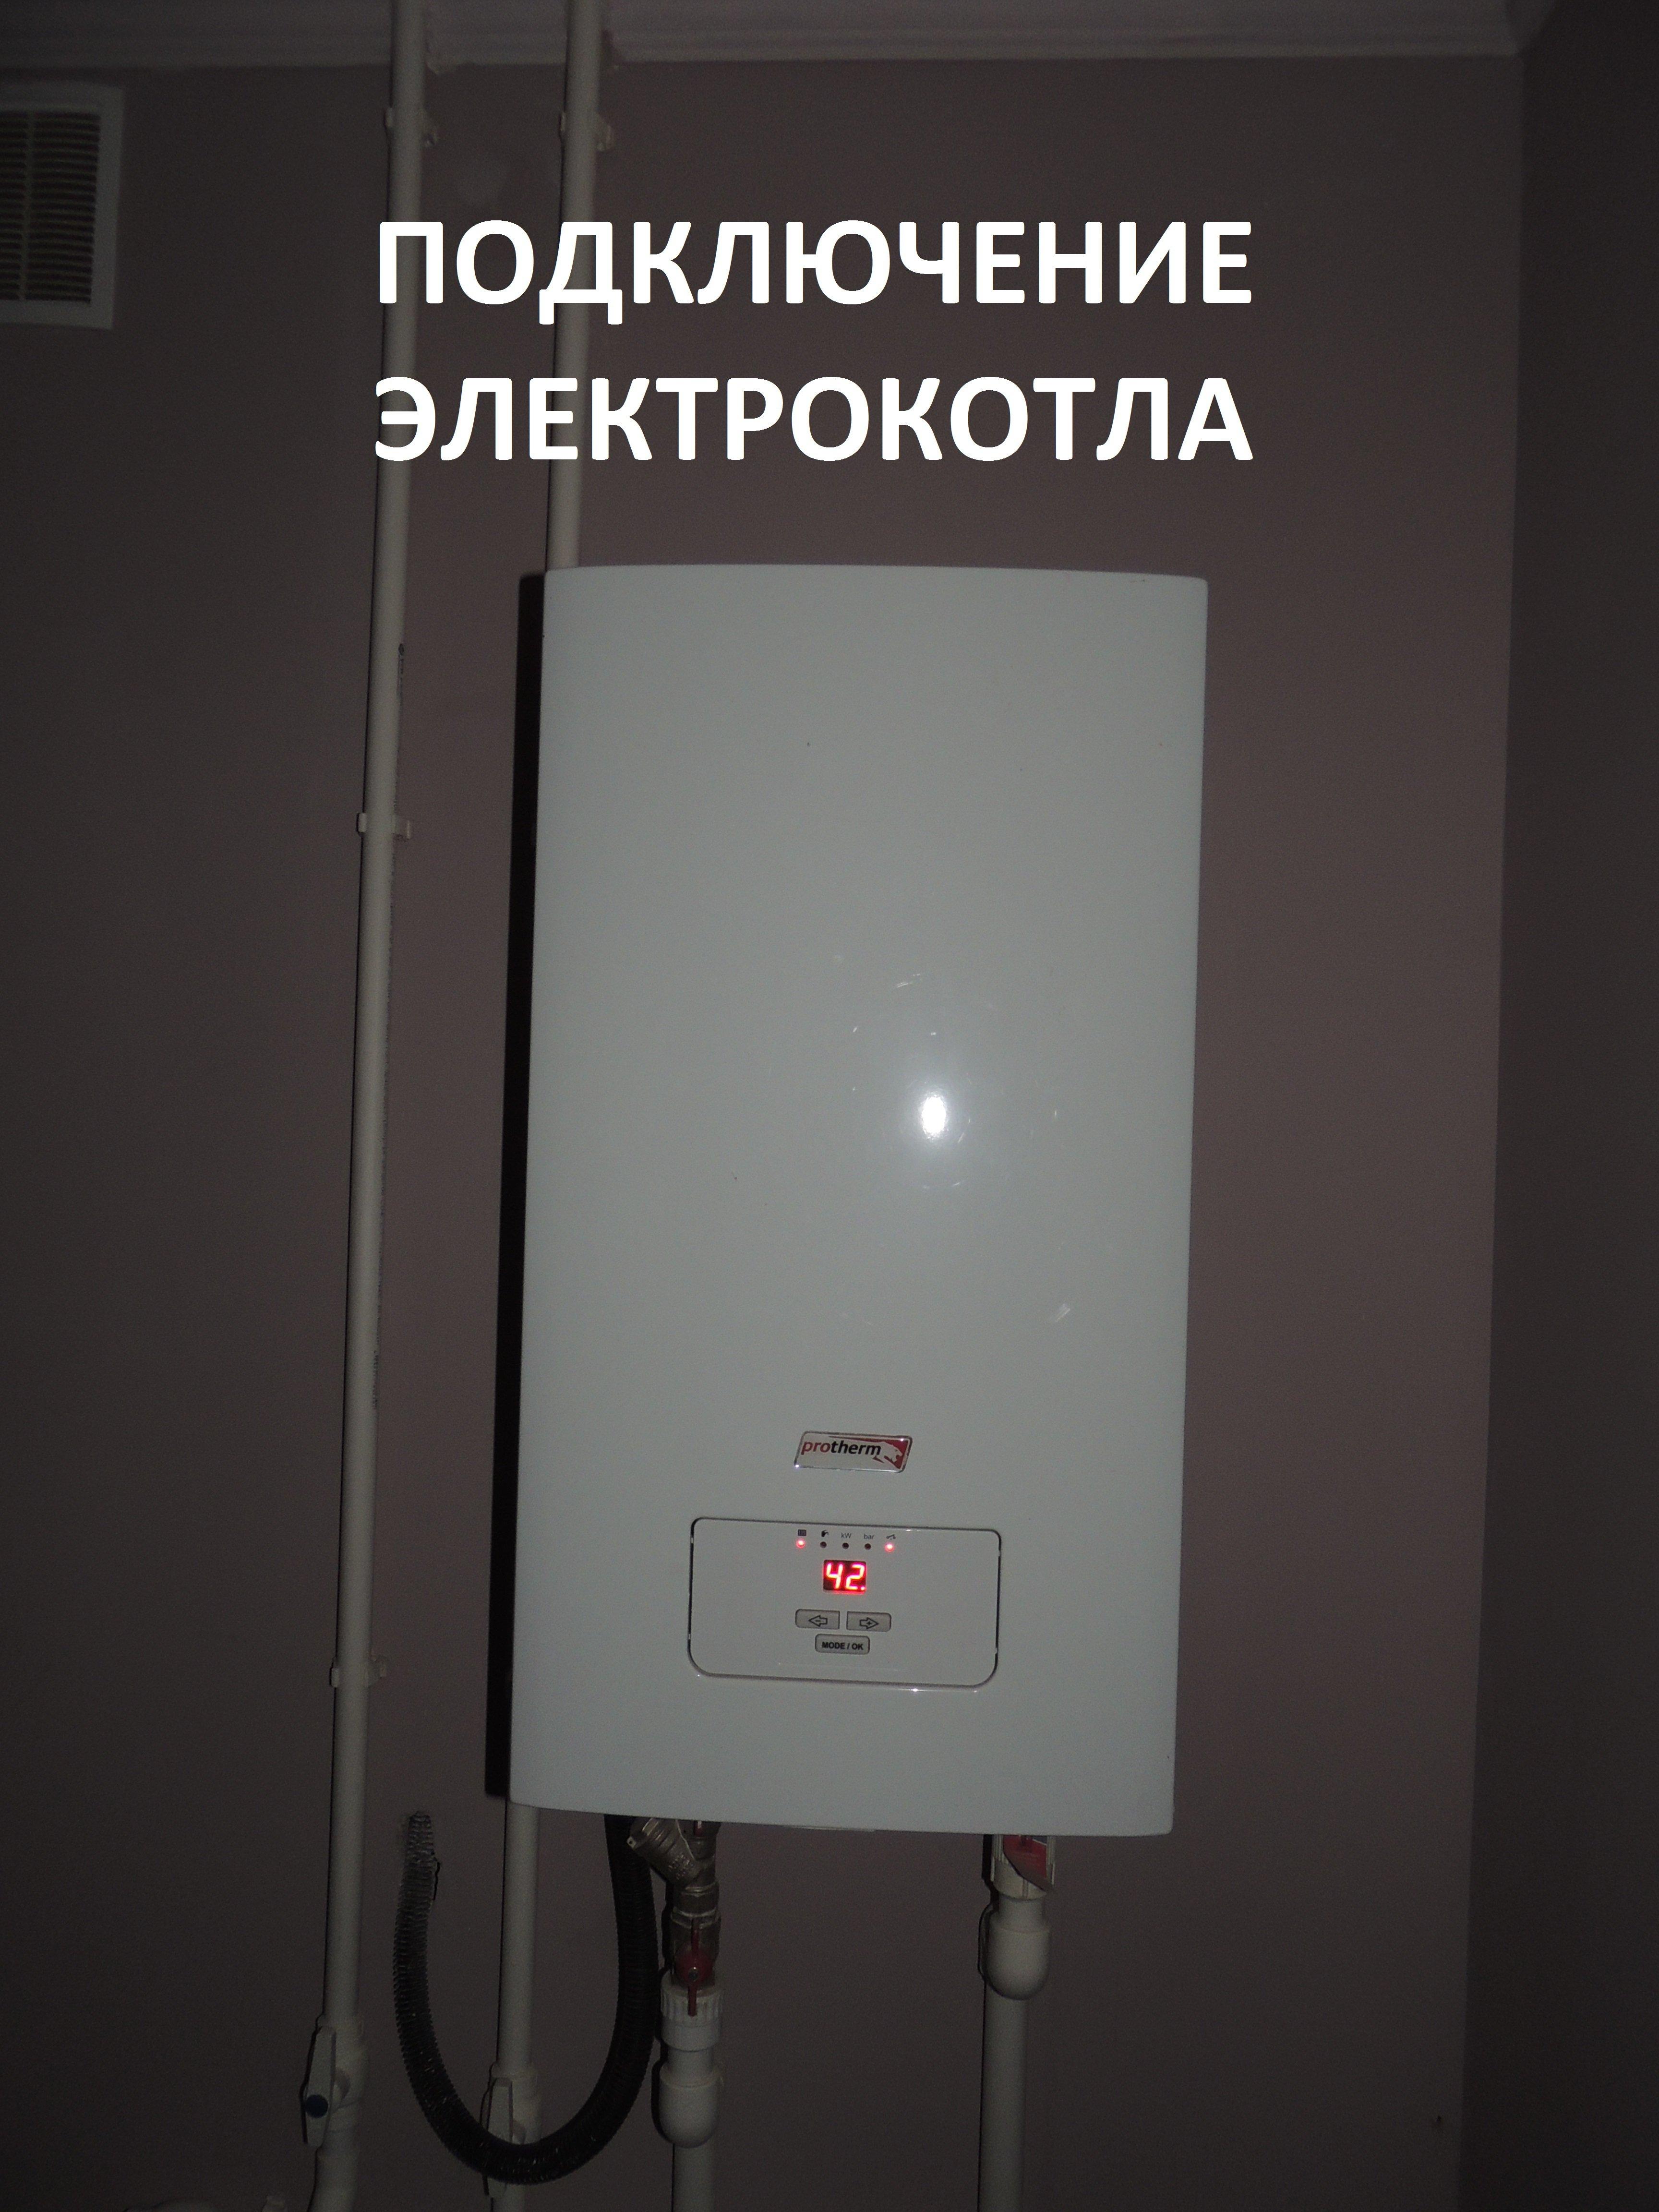 Котлы protherm | советы электрика